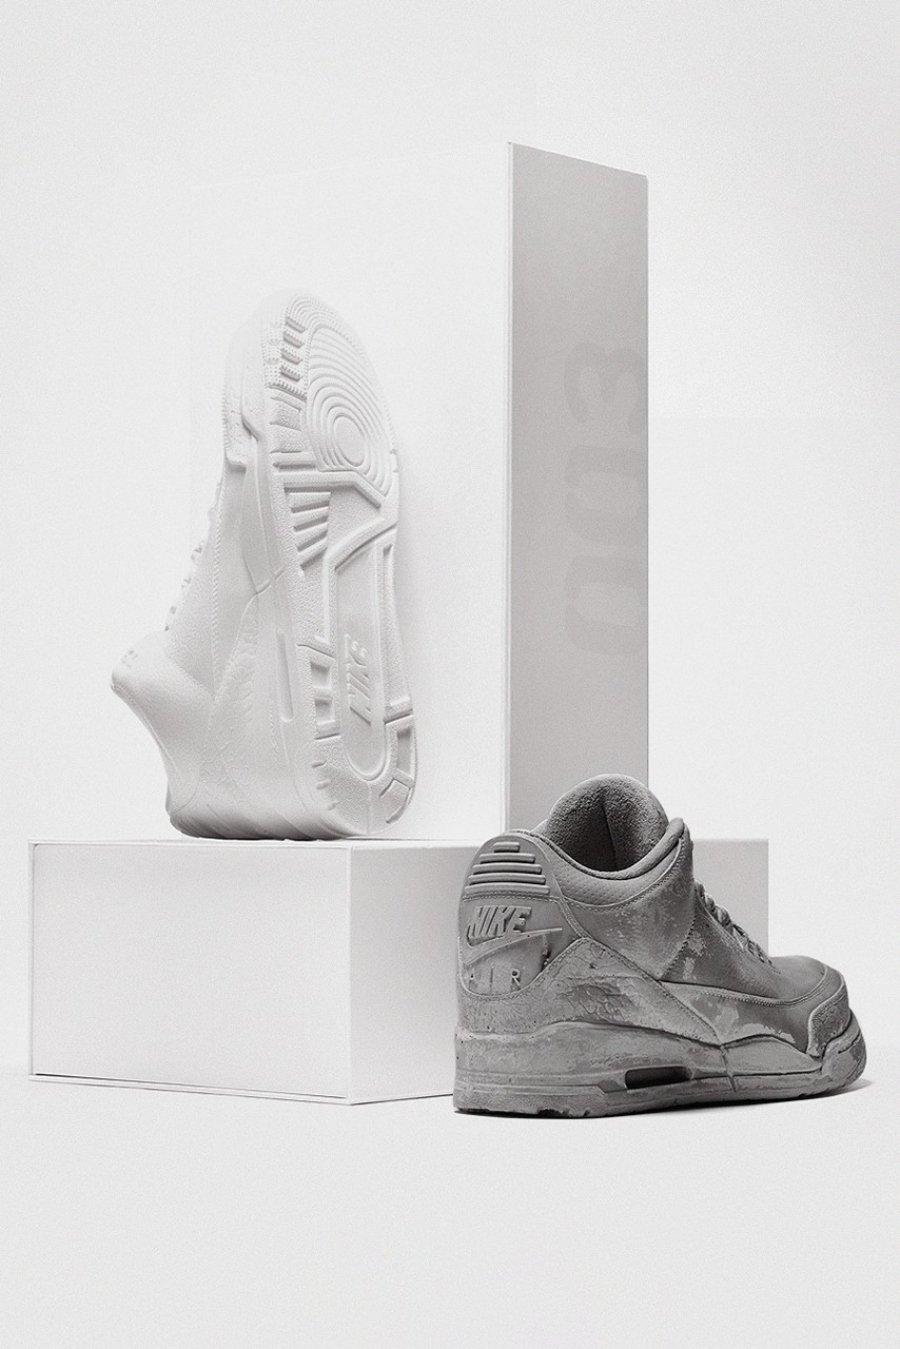 Nuevas sneakers de Matthew Senna, Study 003